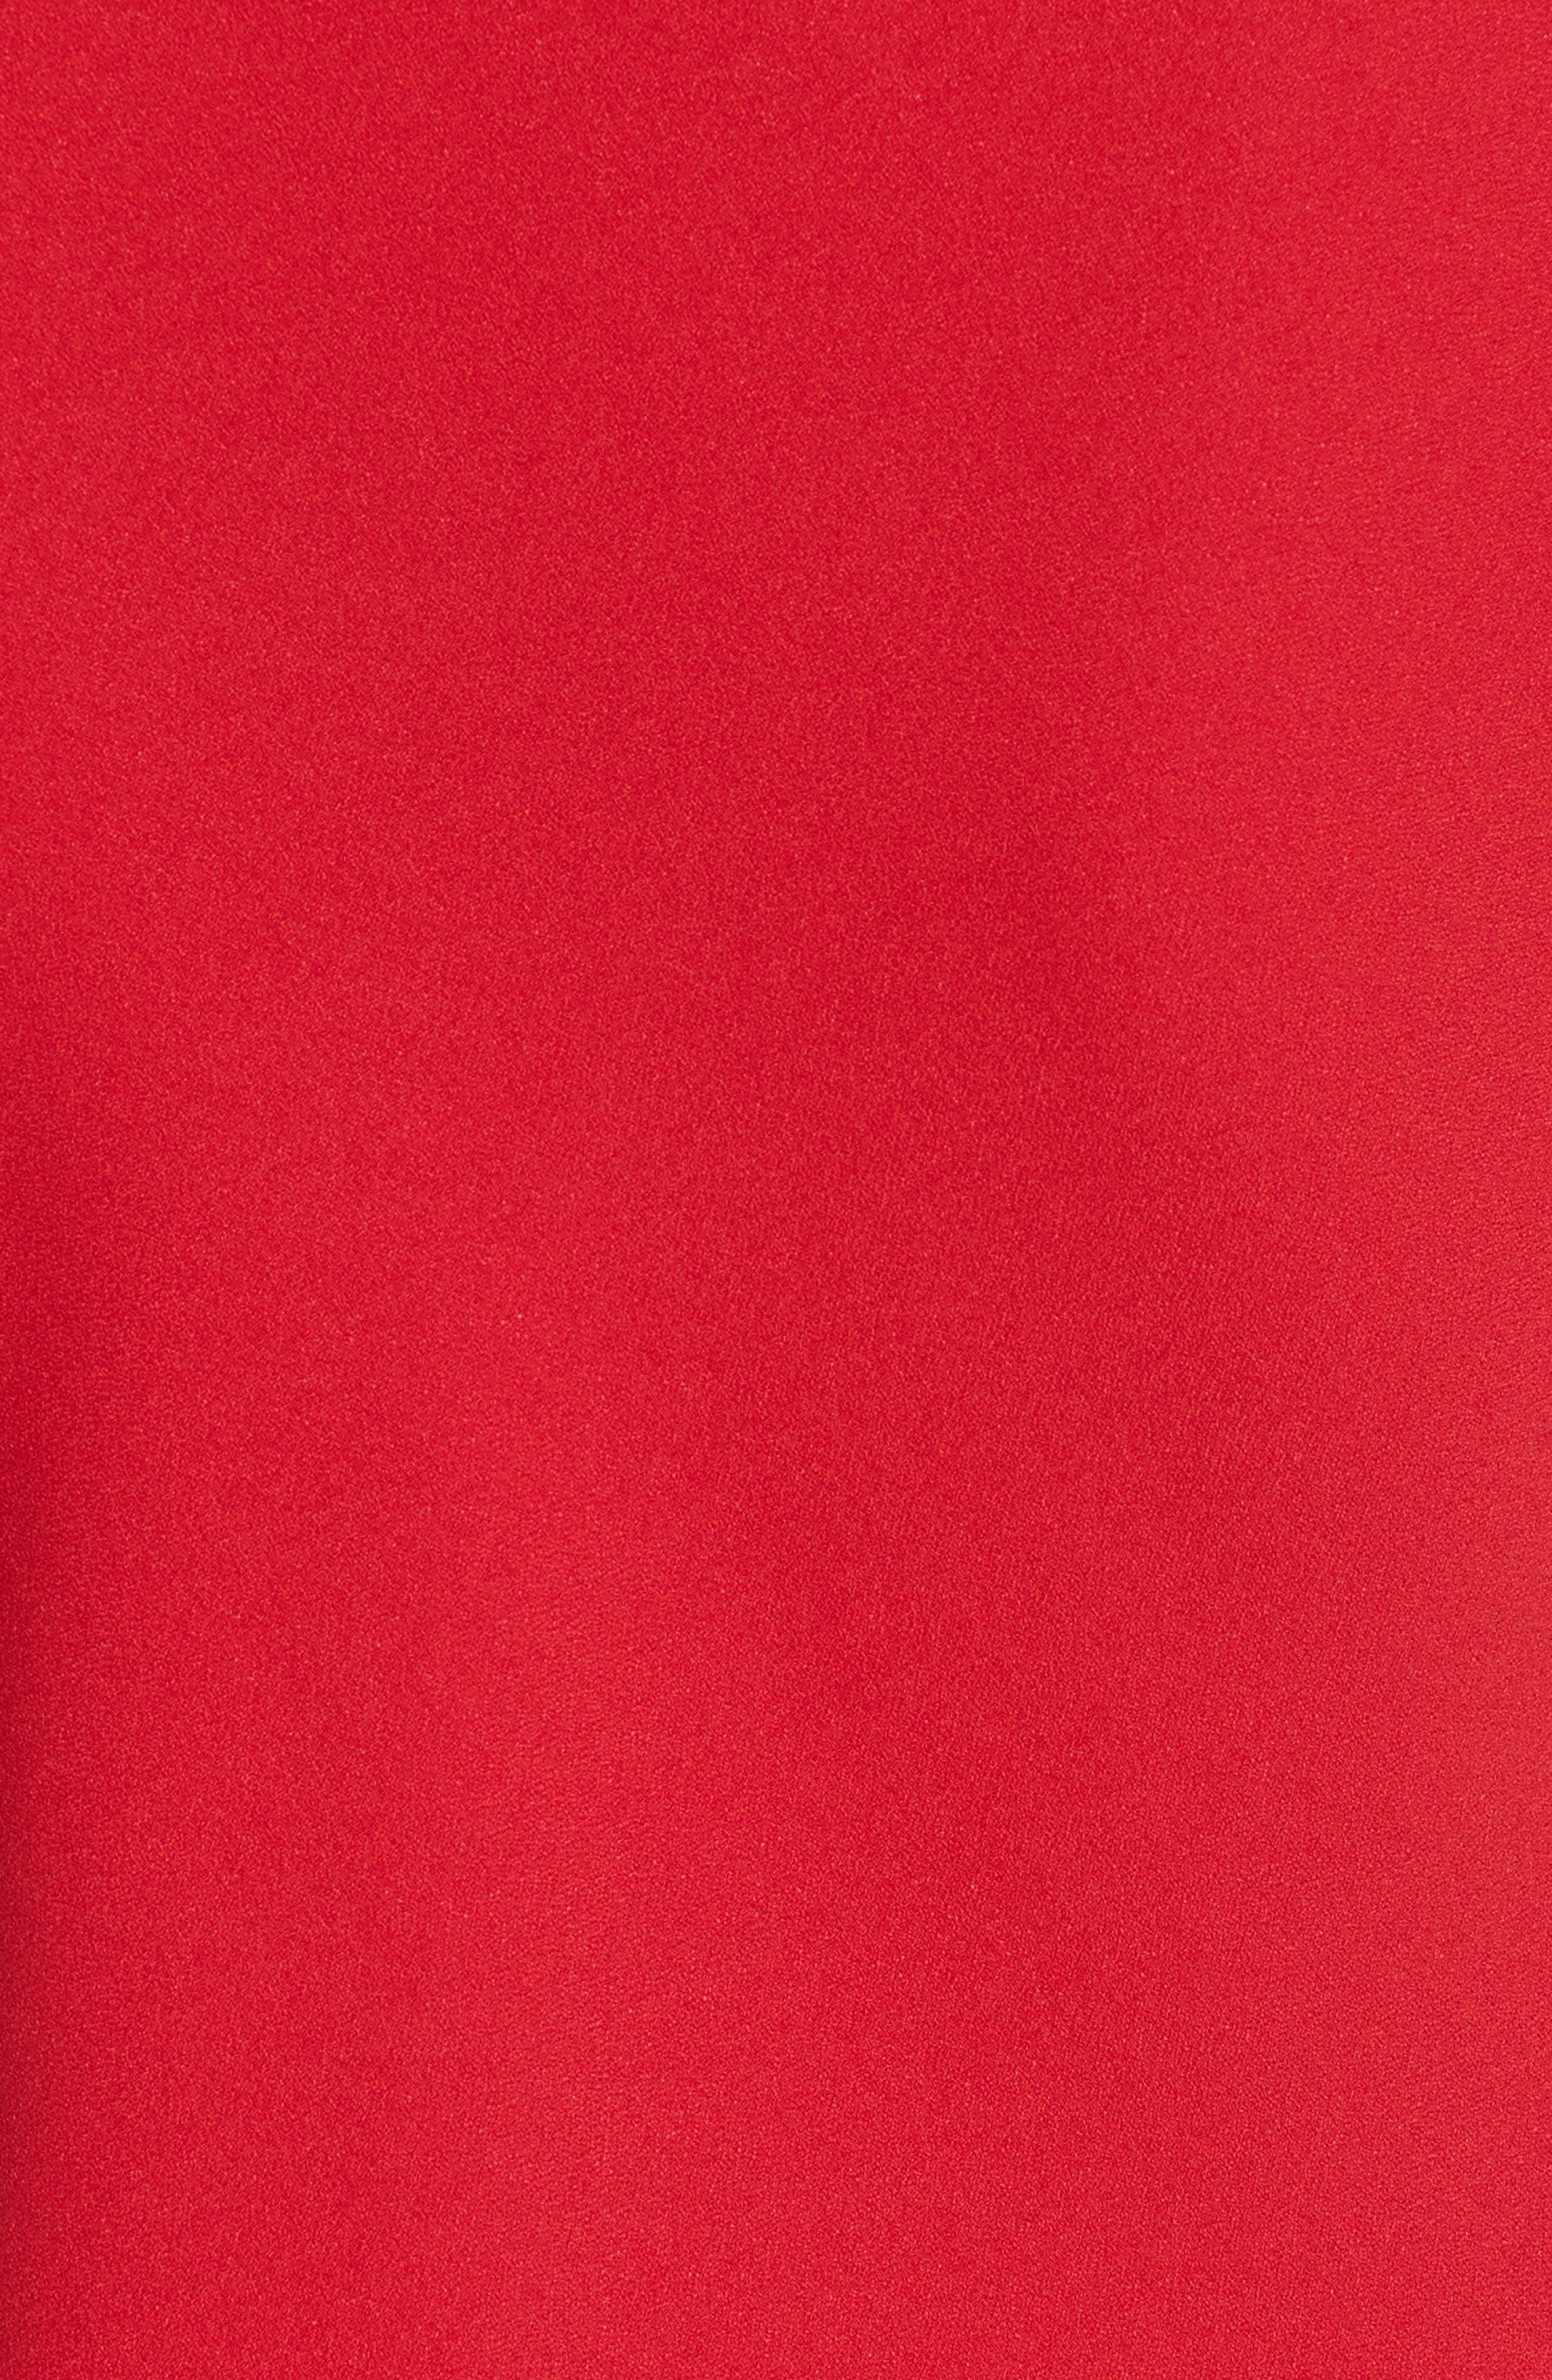 Alternate Image 3  - Victoria Beckham Satin Crepe Drape Top